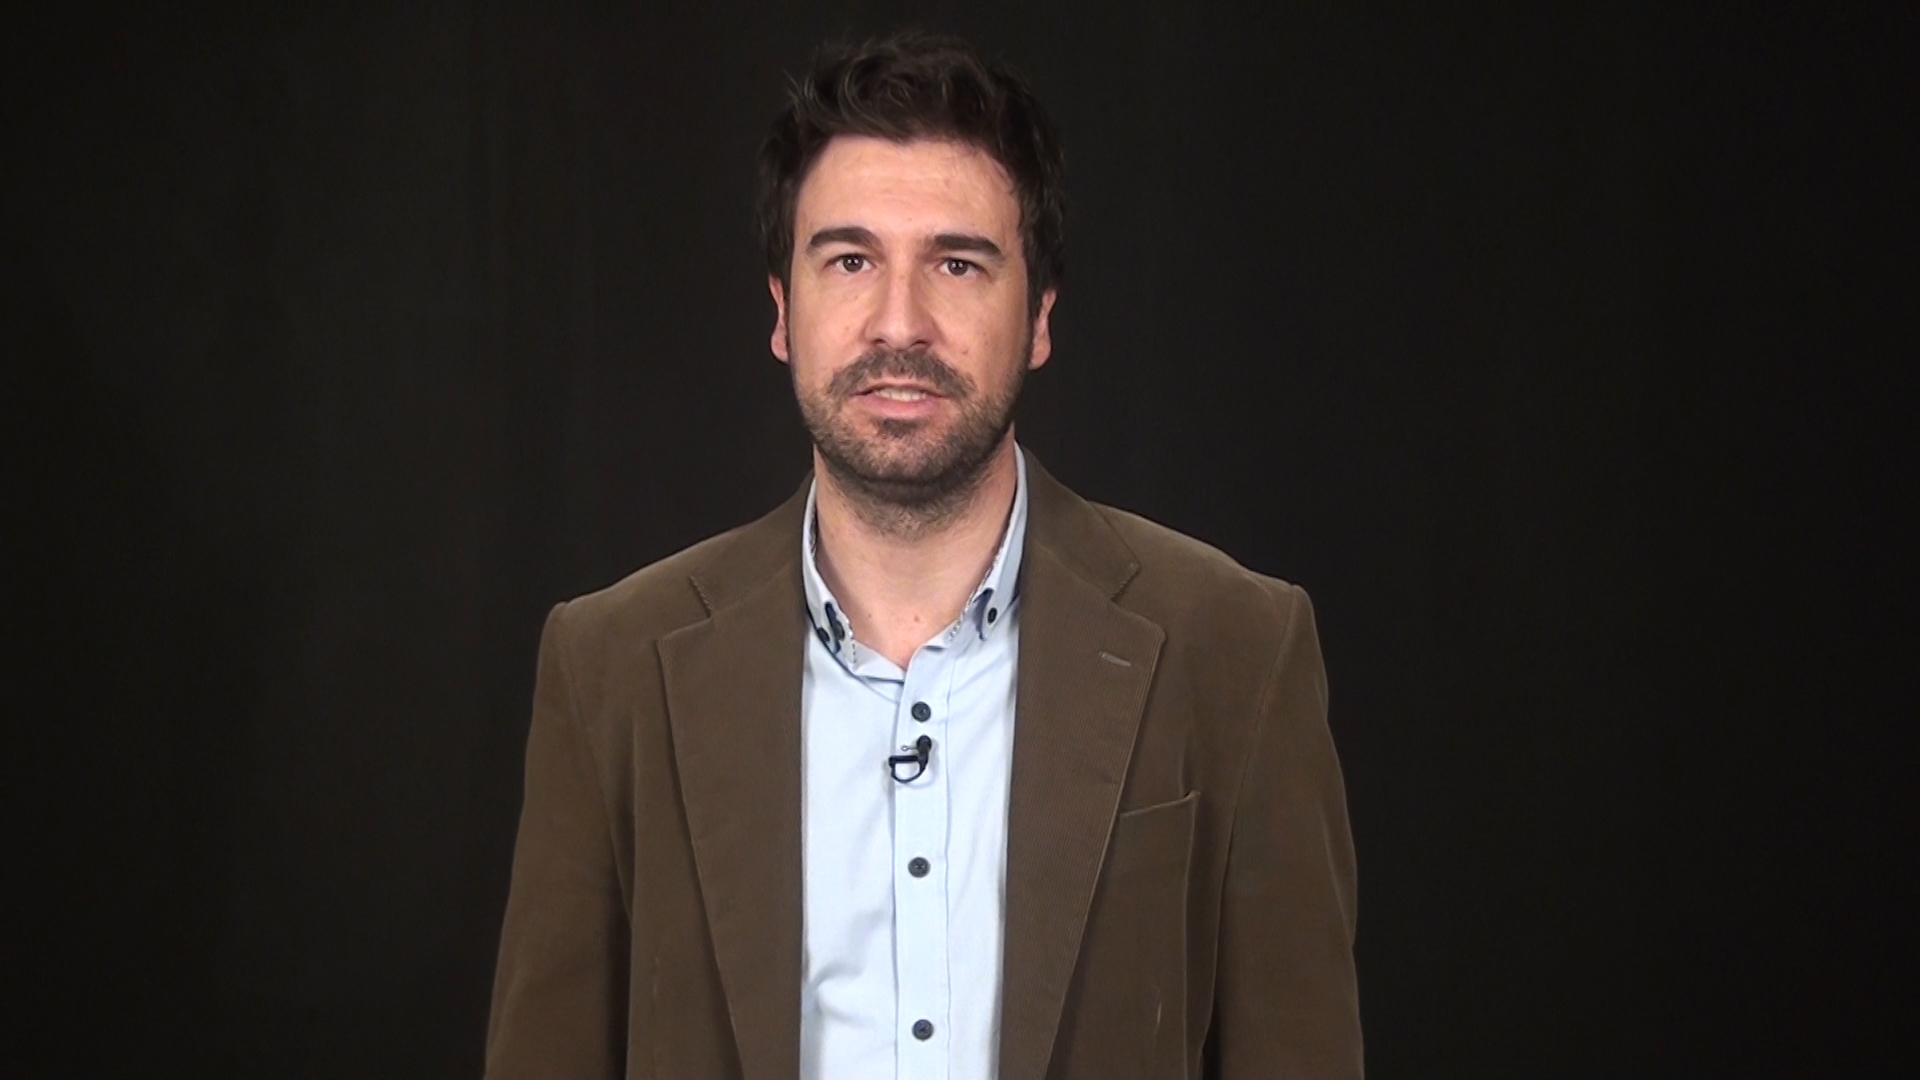 David Úbeda